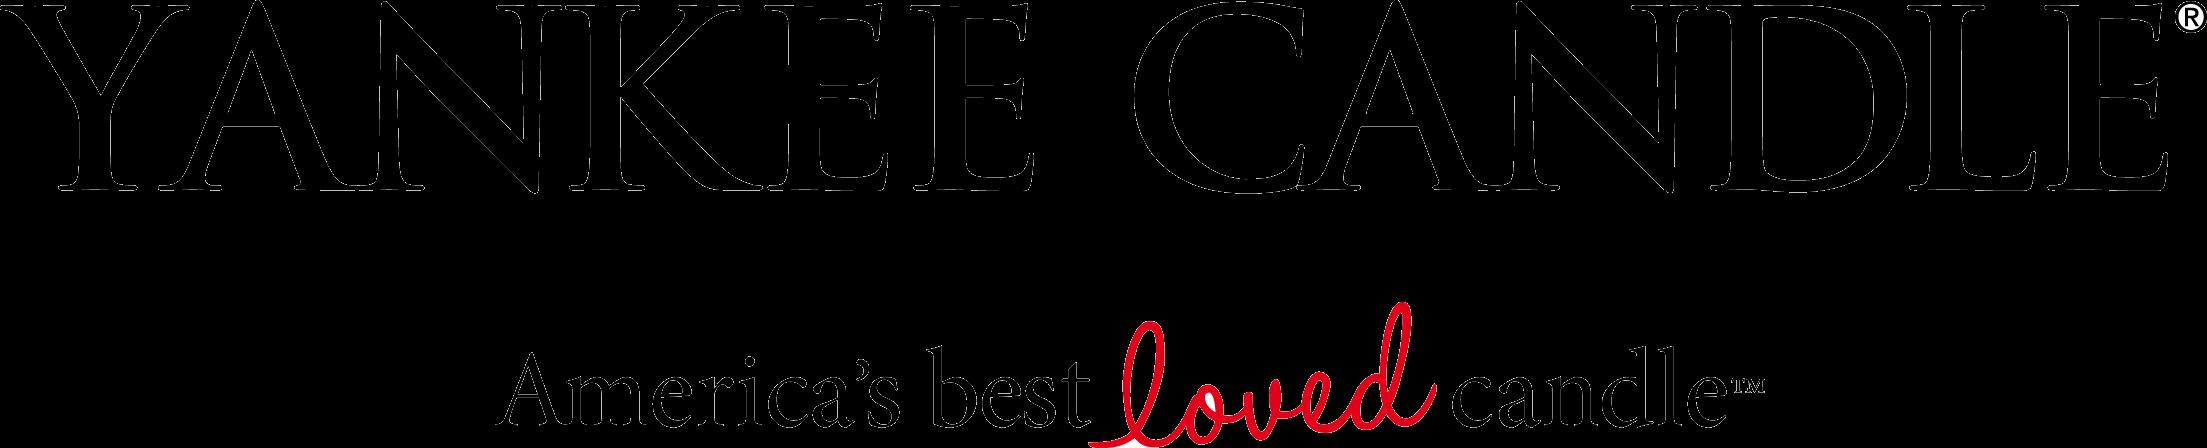 yankee-candle-logo-transparent